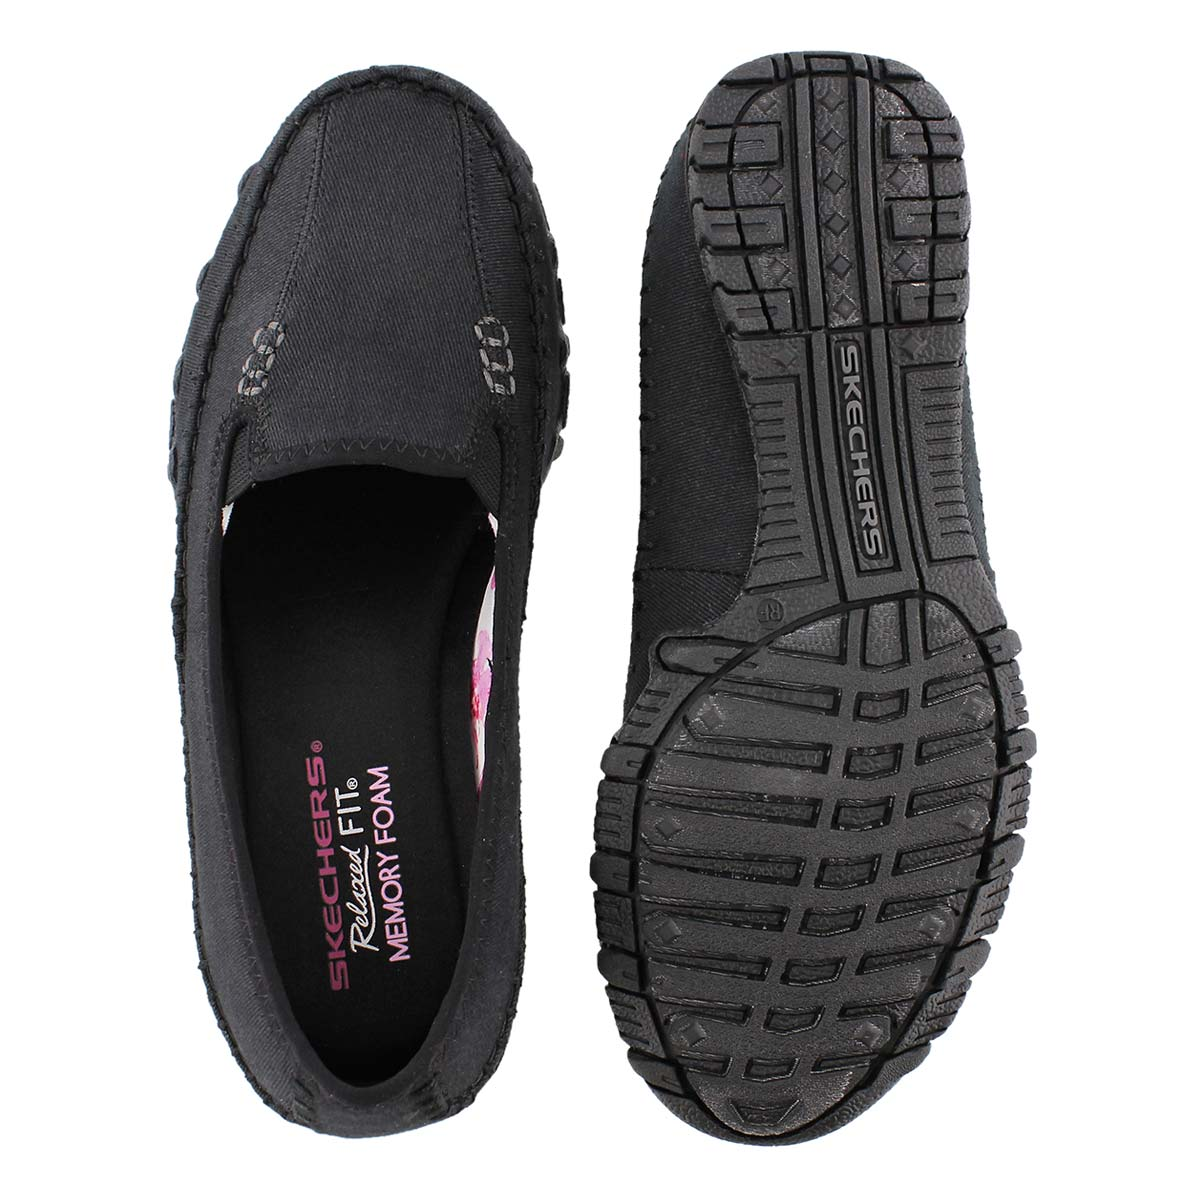 Lds Jaywalk black slip on casual shoe